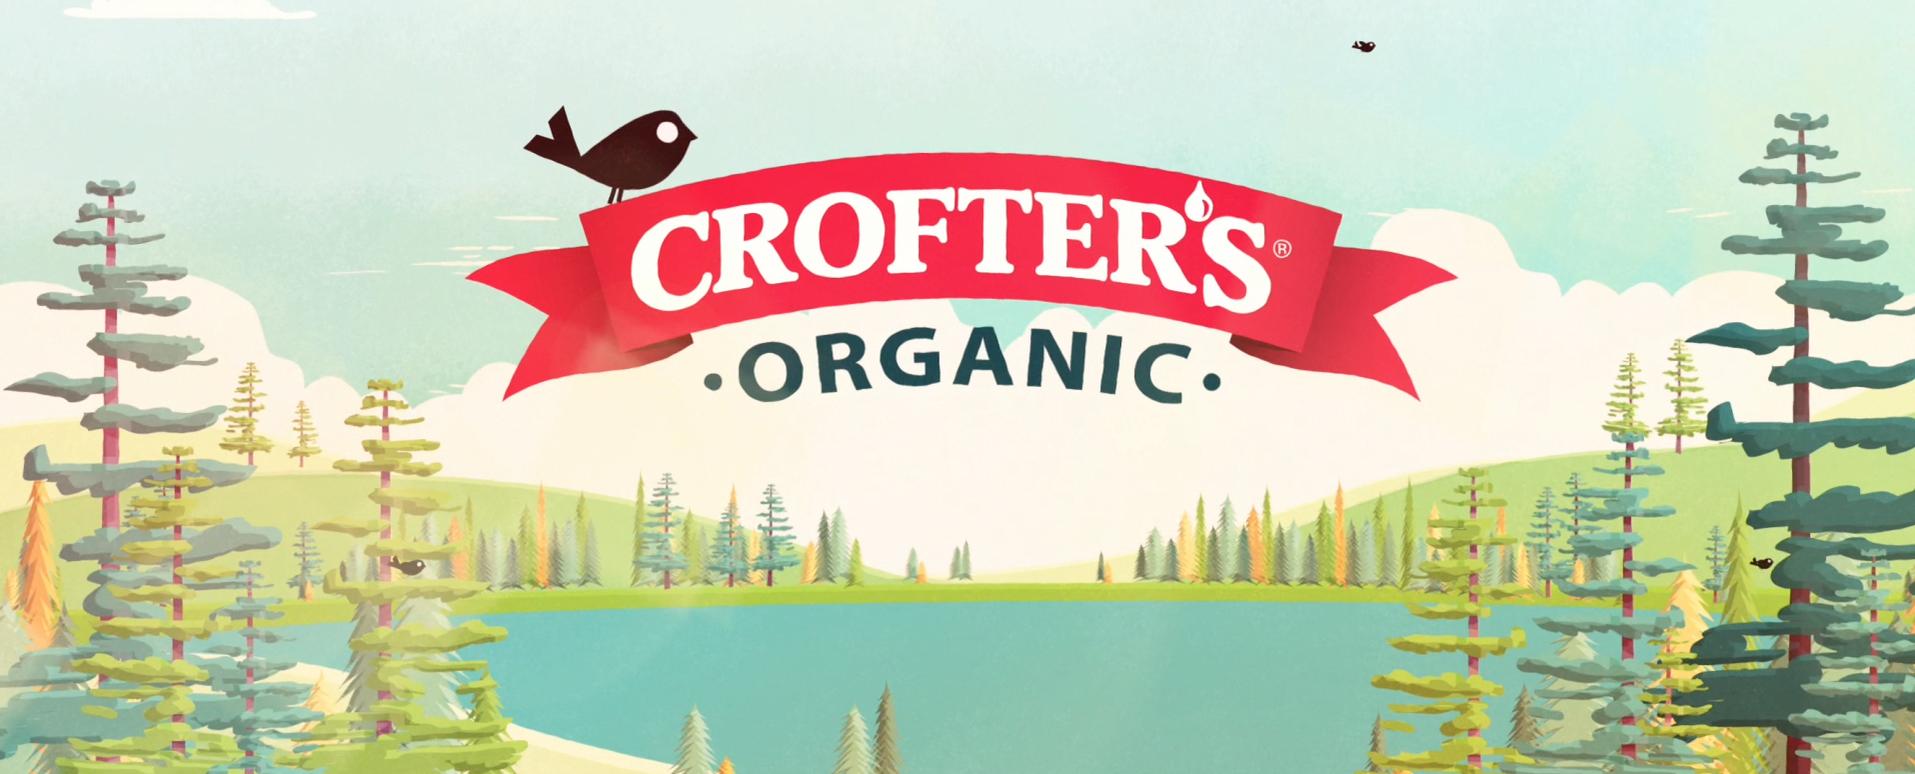 Crofters Organic Jam Animation